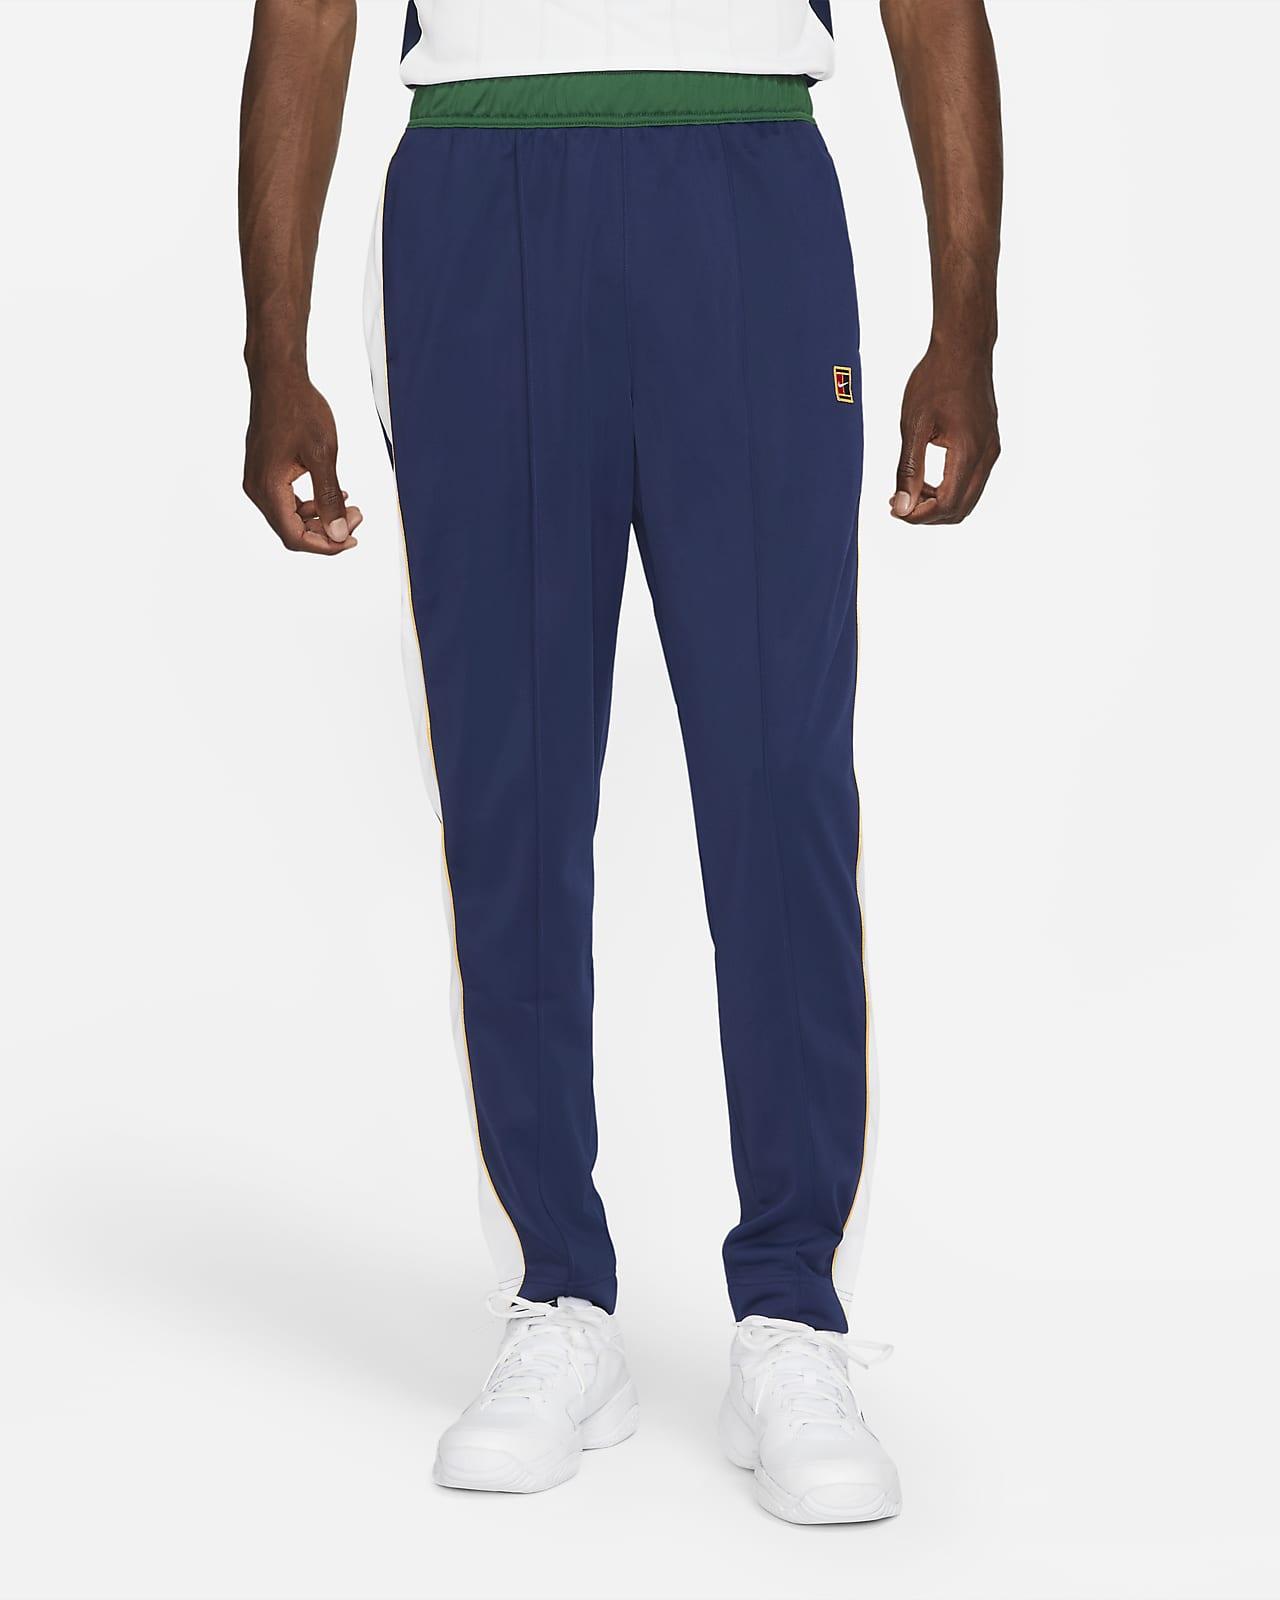 NikeCourt Men's Tennis Pants